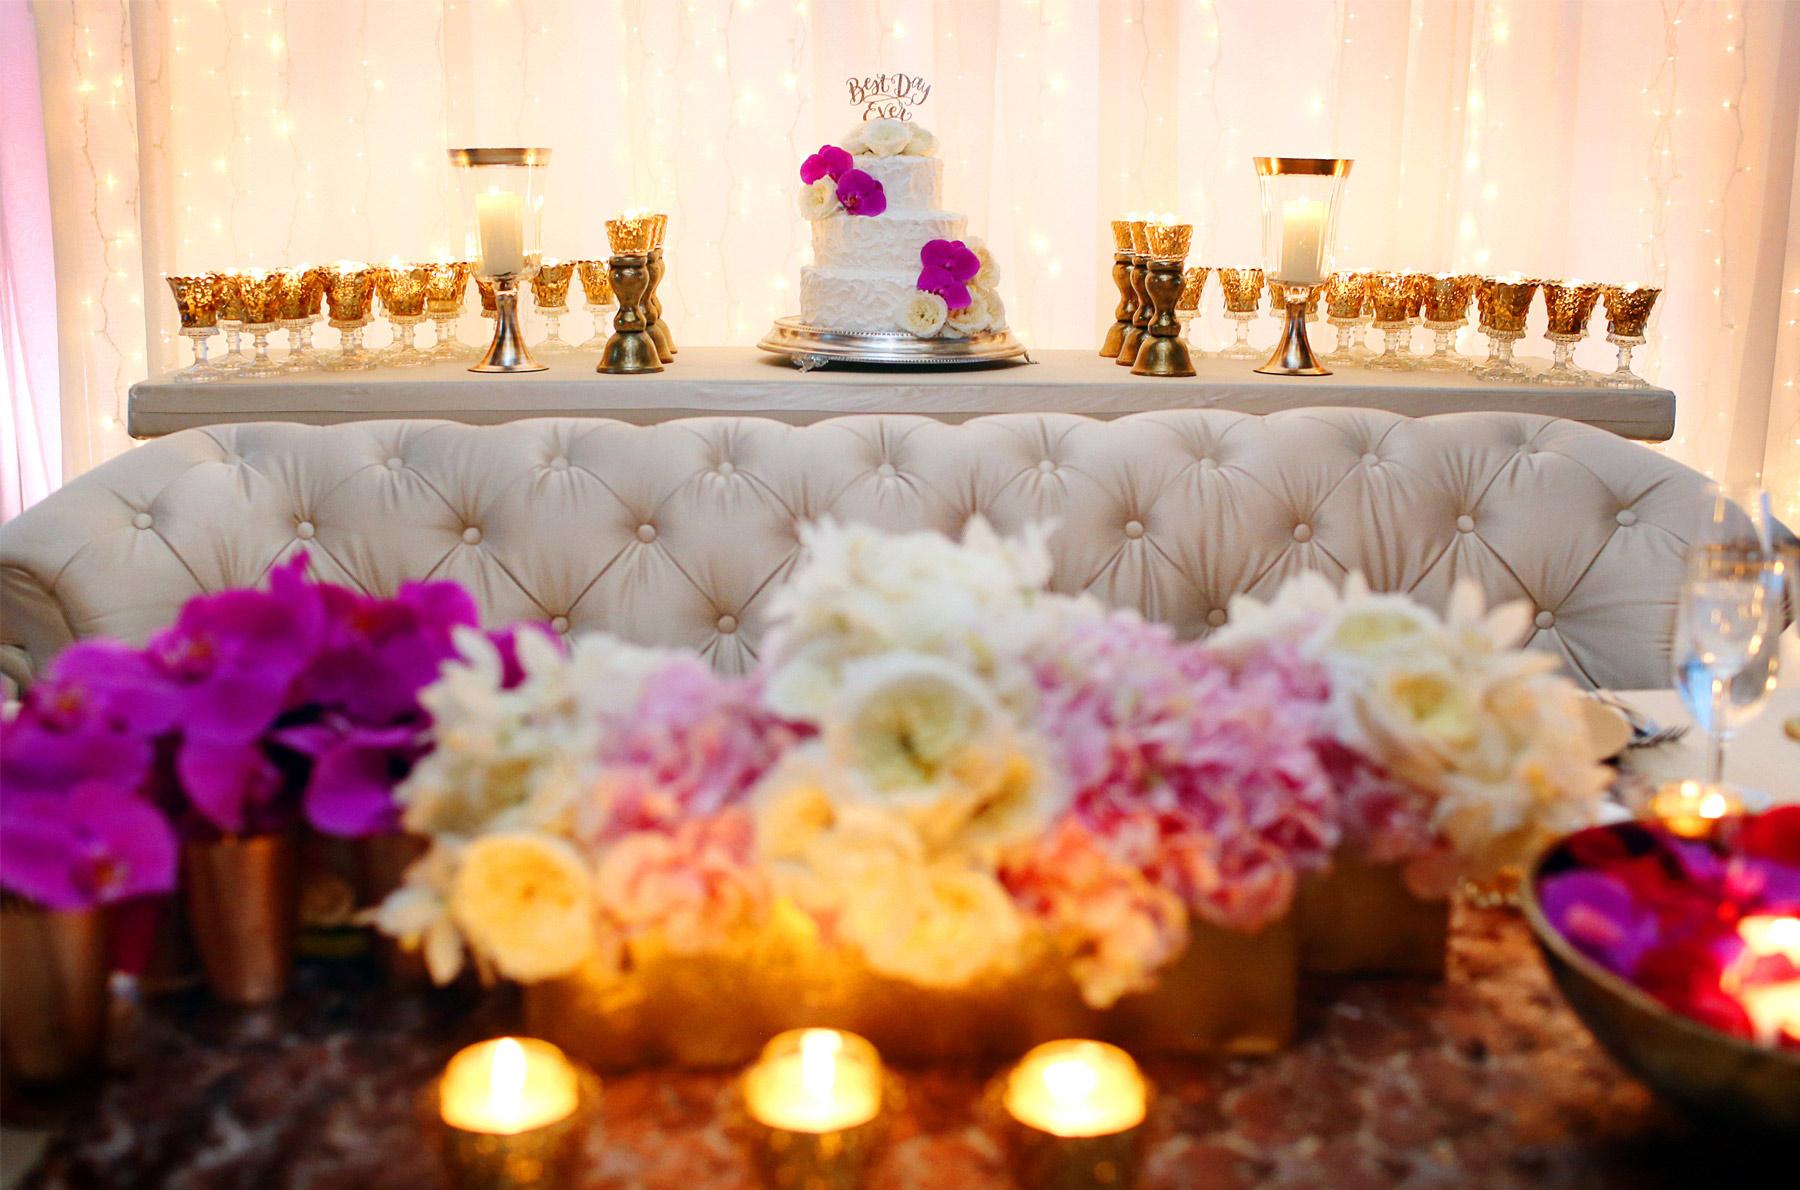 16-Puerto-Rico-Wedding-Photography-by-Vick-Photography-Ritz-Carlton-Reserve-Destination-Wedding-Island-Tropical-Paradise-Resort-Reception-Decor-Flowers-Chanel-and-Sam.jpg